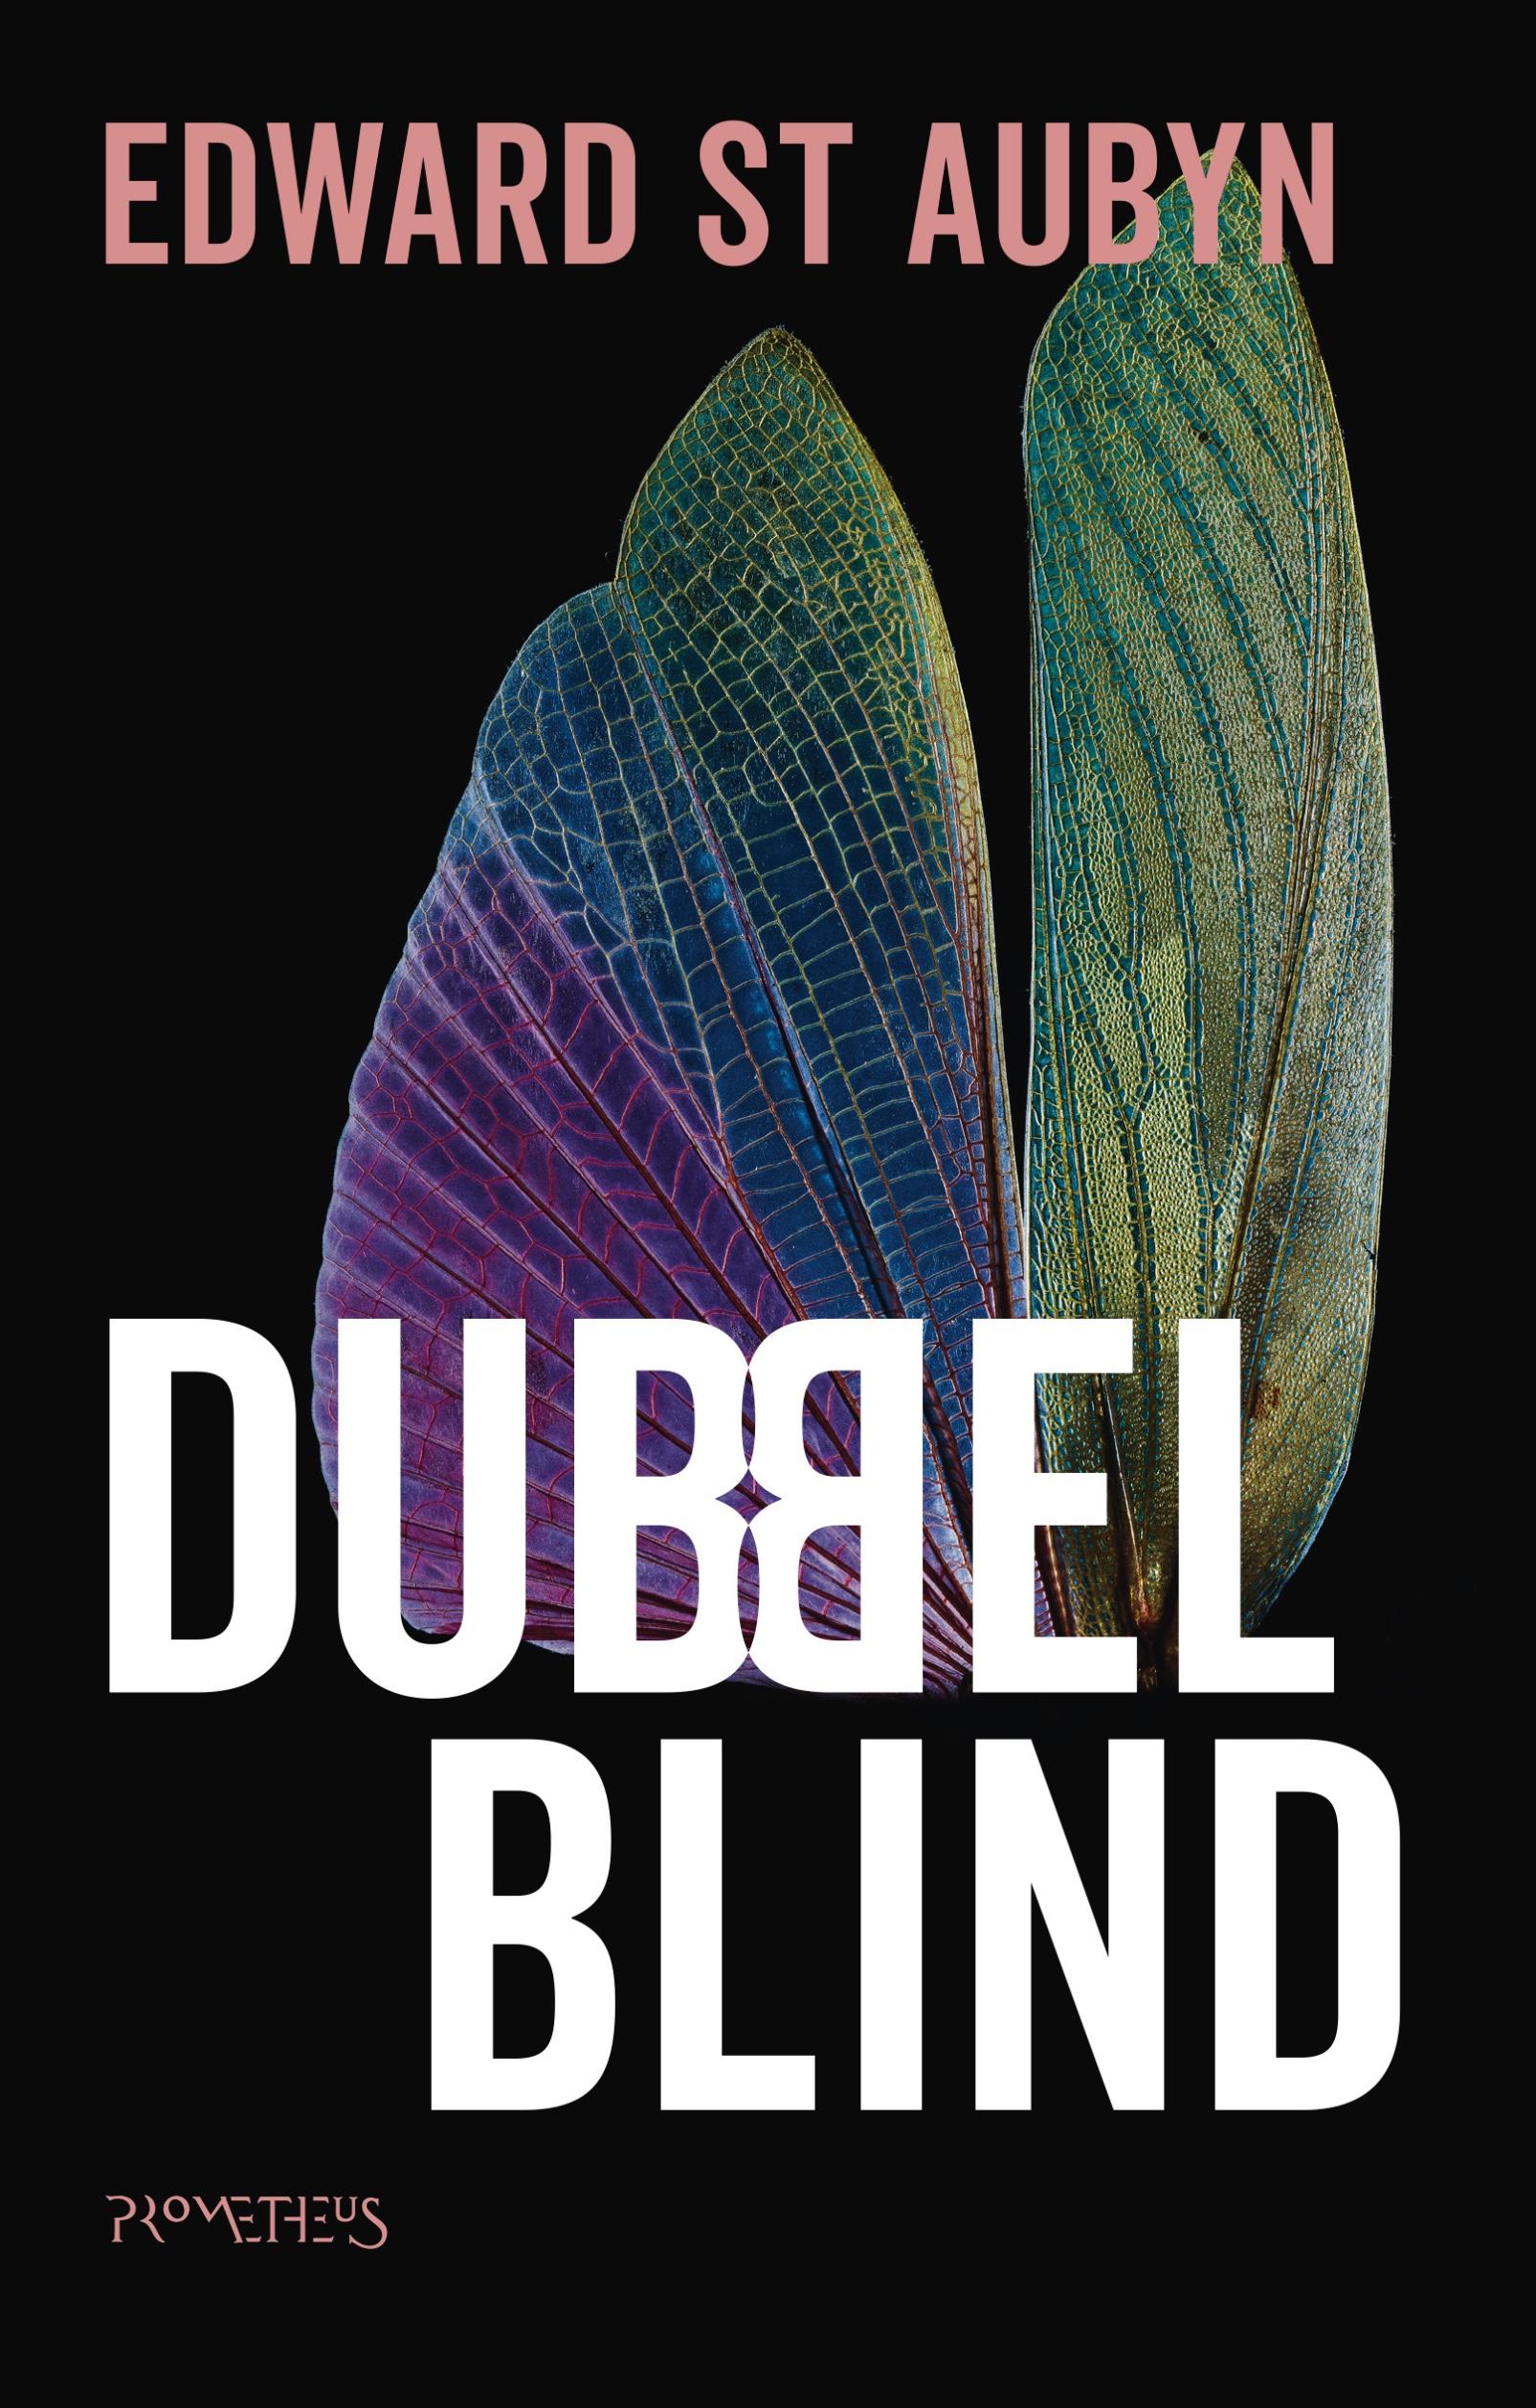 Dubbelblind - boekenflits